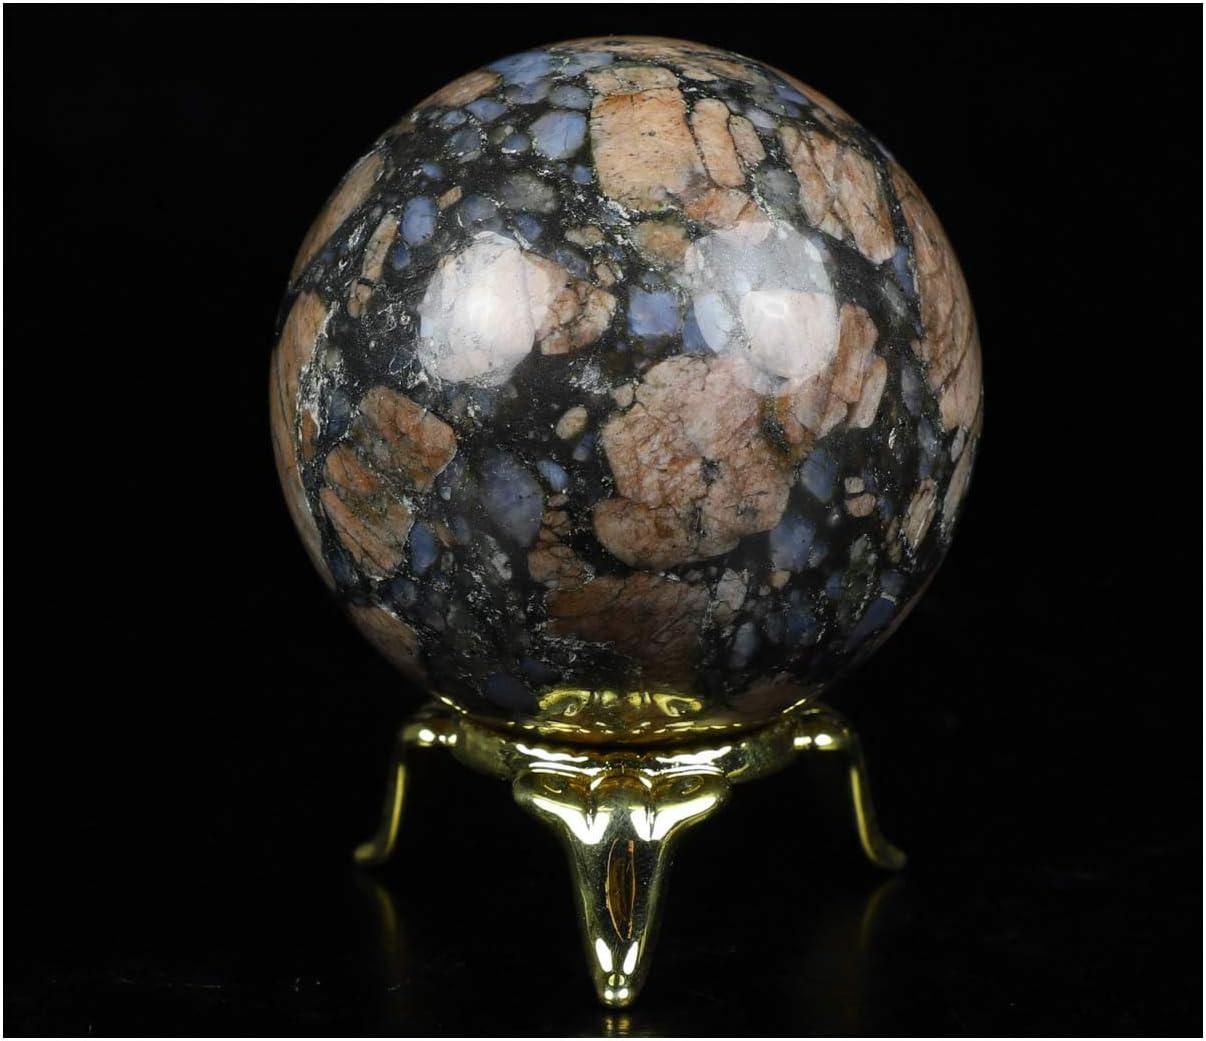 "Rikoo 2.0"" Que Sera Stone Llanite Crystal Ball Sphere with Metal Stand, Gemstone Ball Sphere, Fine Art Sculpture, Reiki Healing Stone Statue.1237"